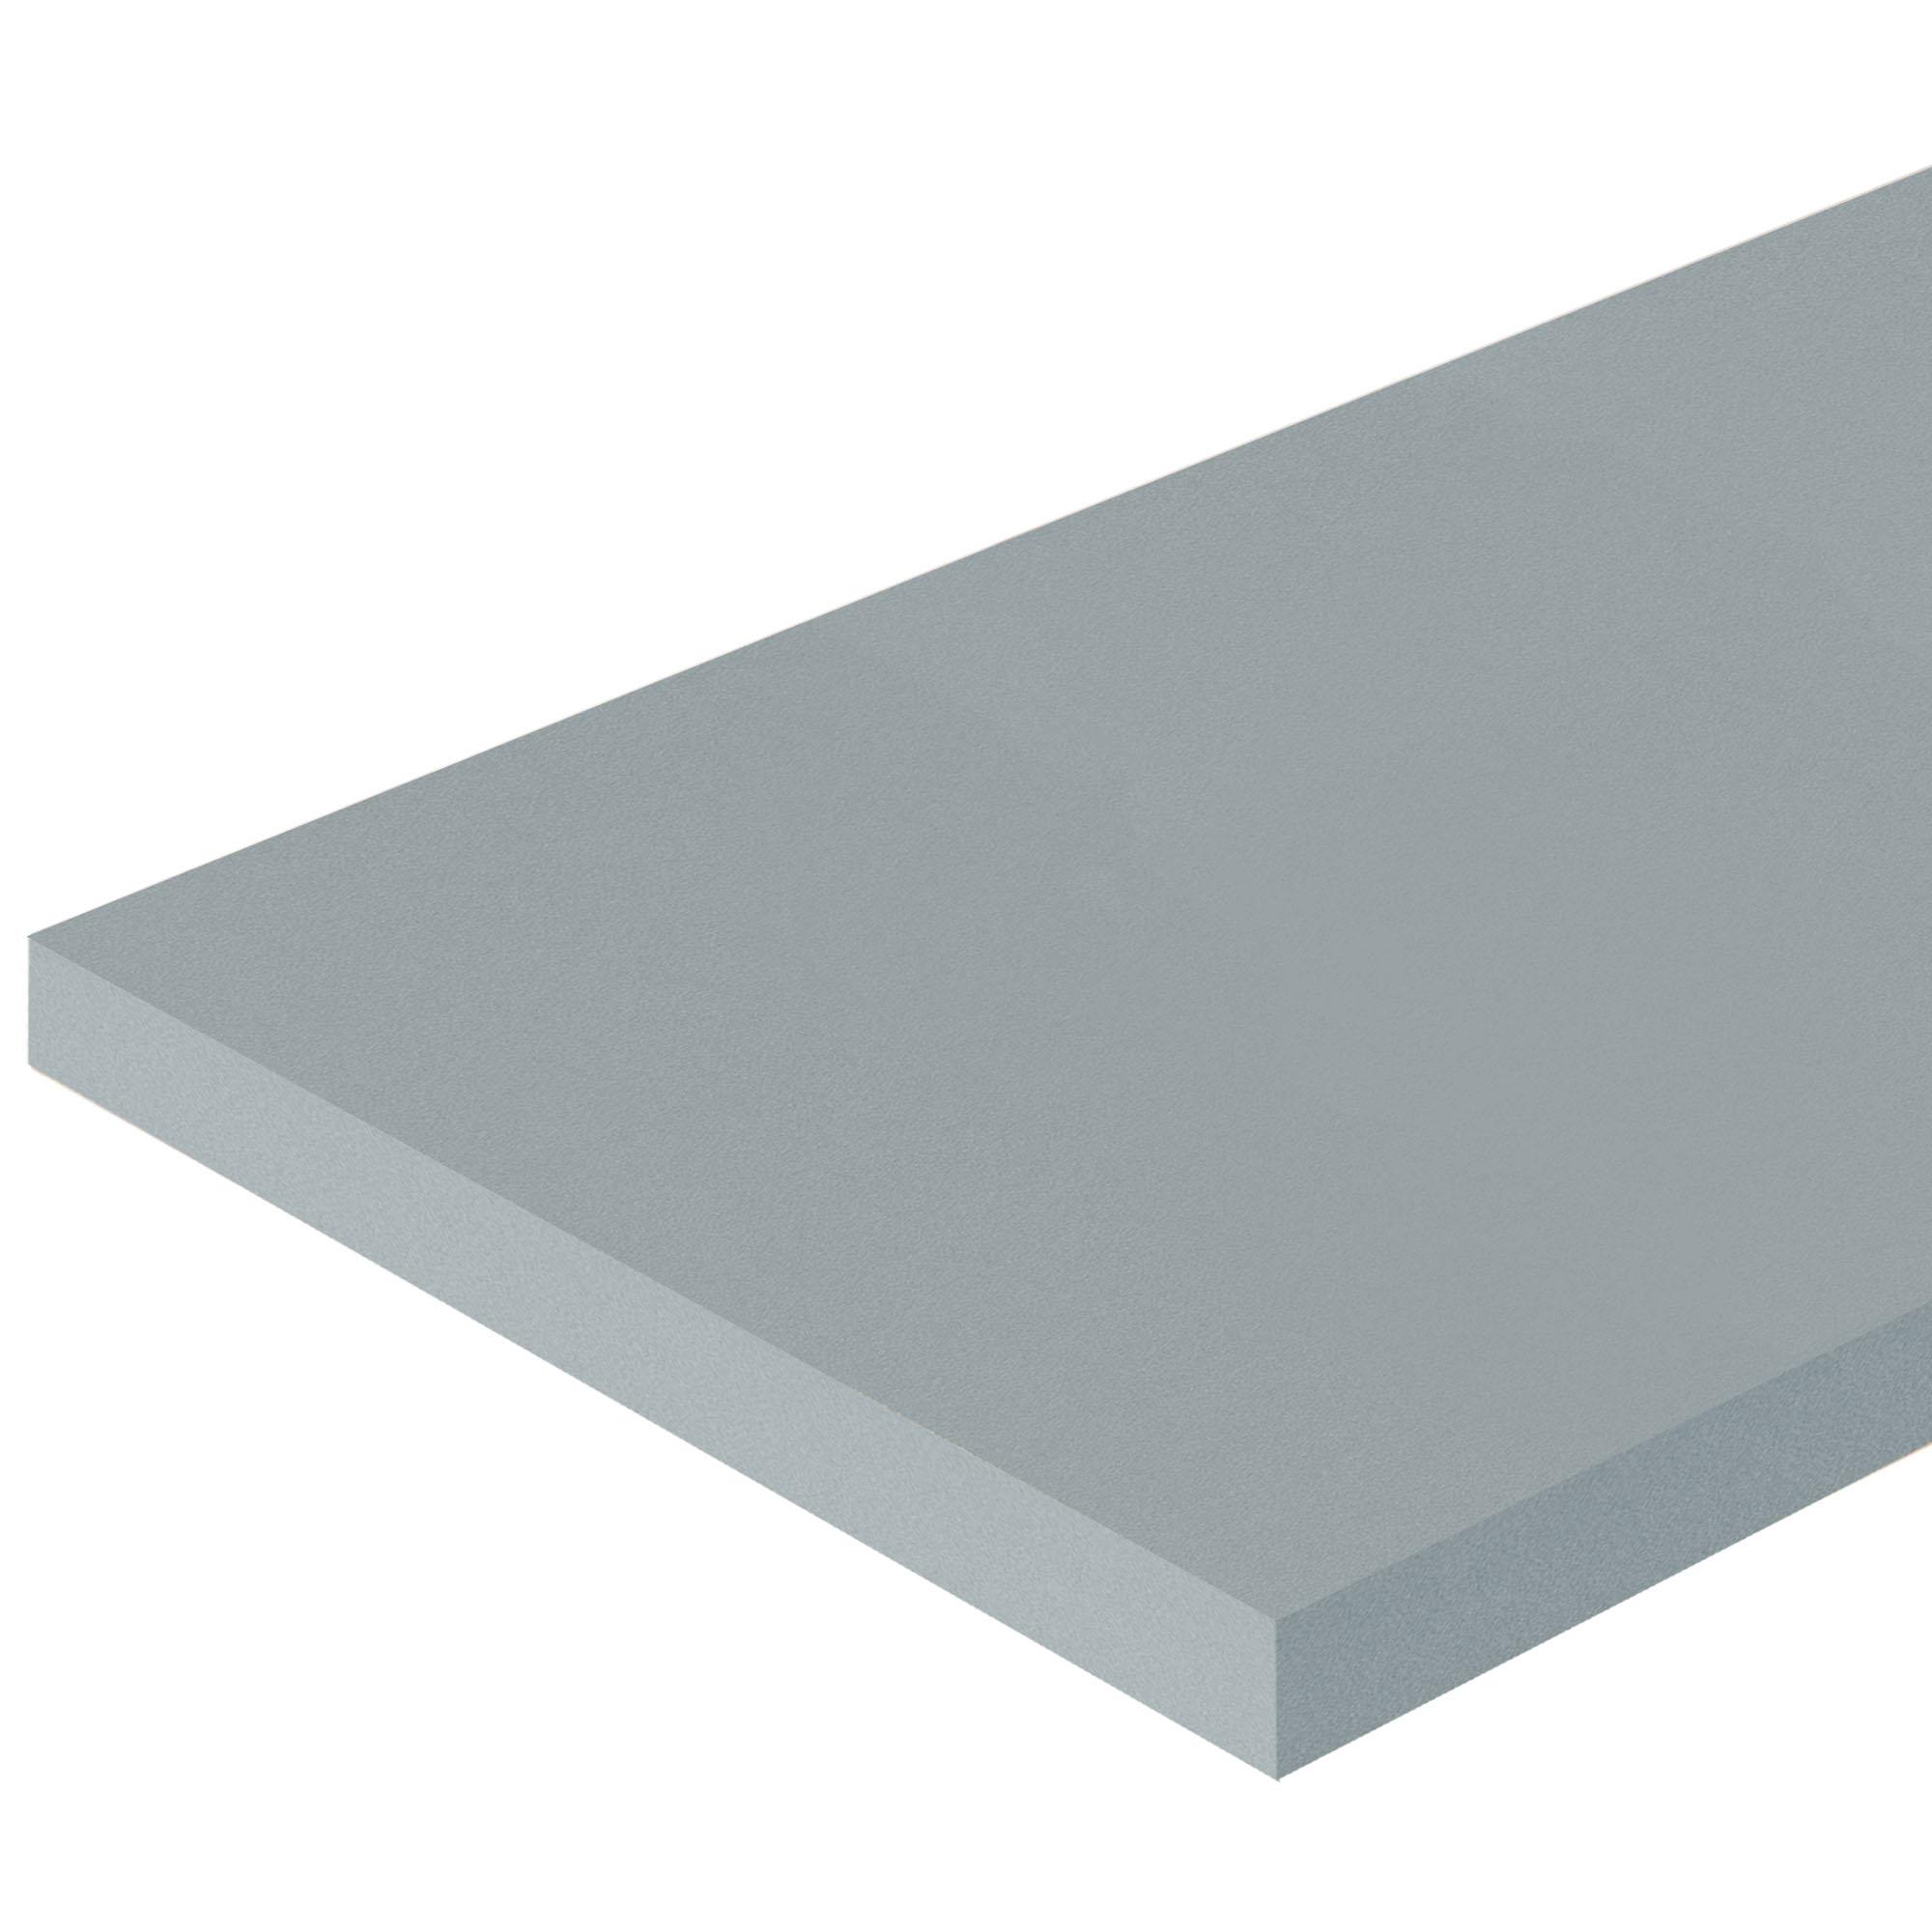 Деталь мебельная 2700х100х16 мм ЛДСП цвет серебристый